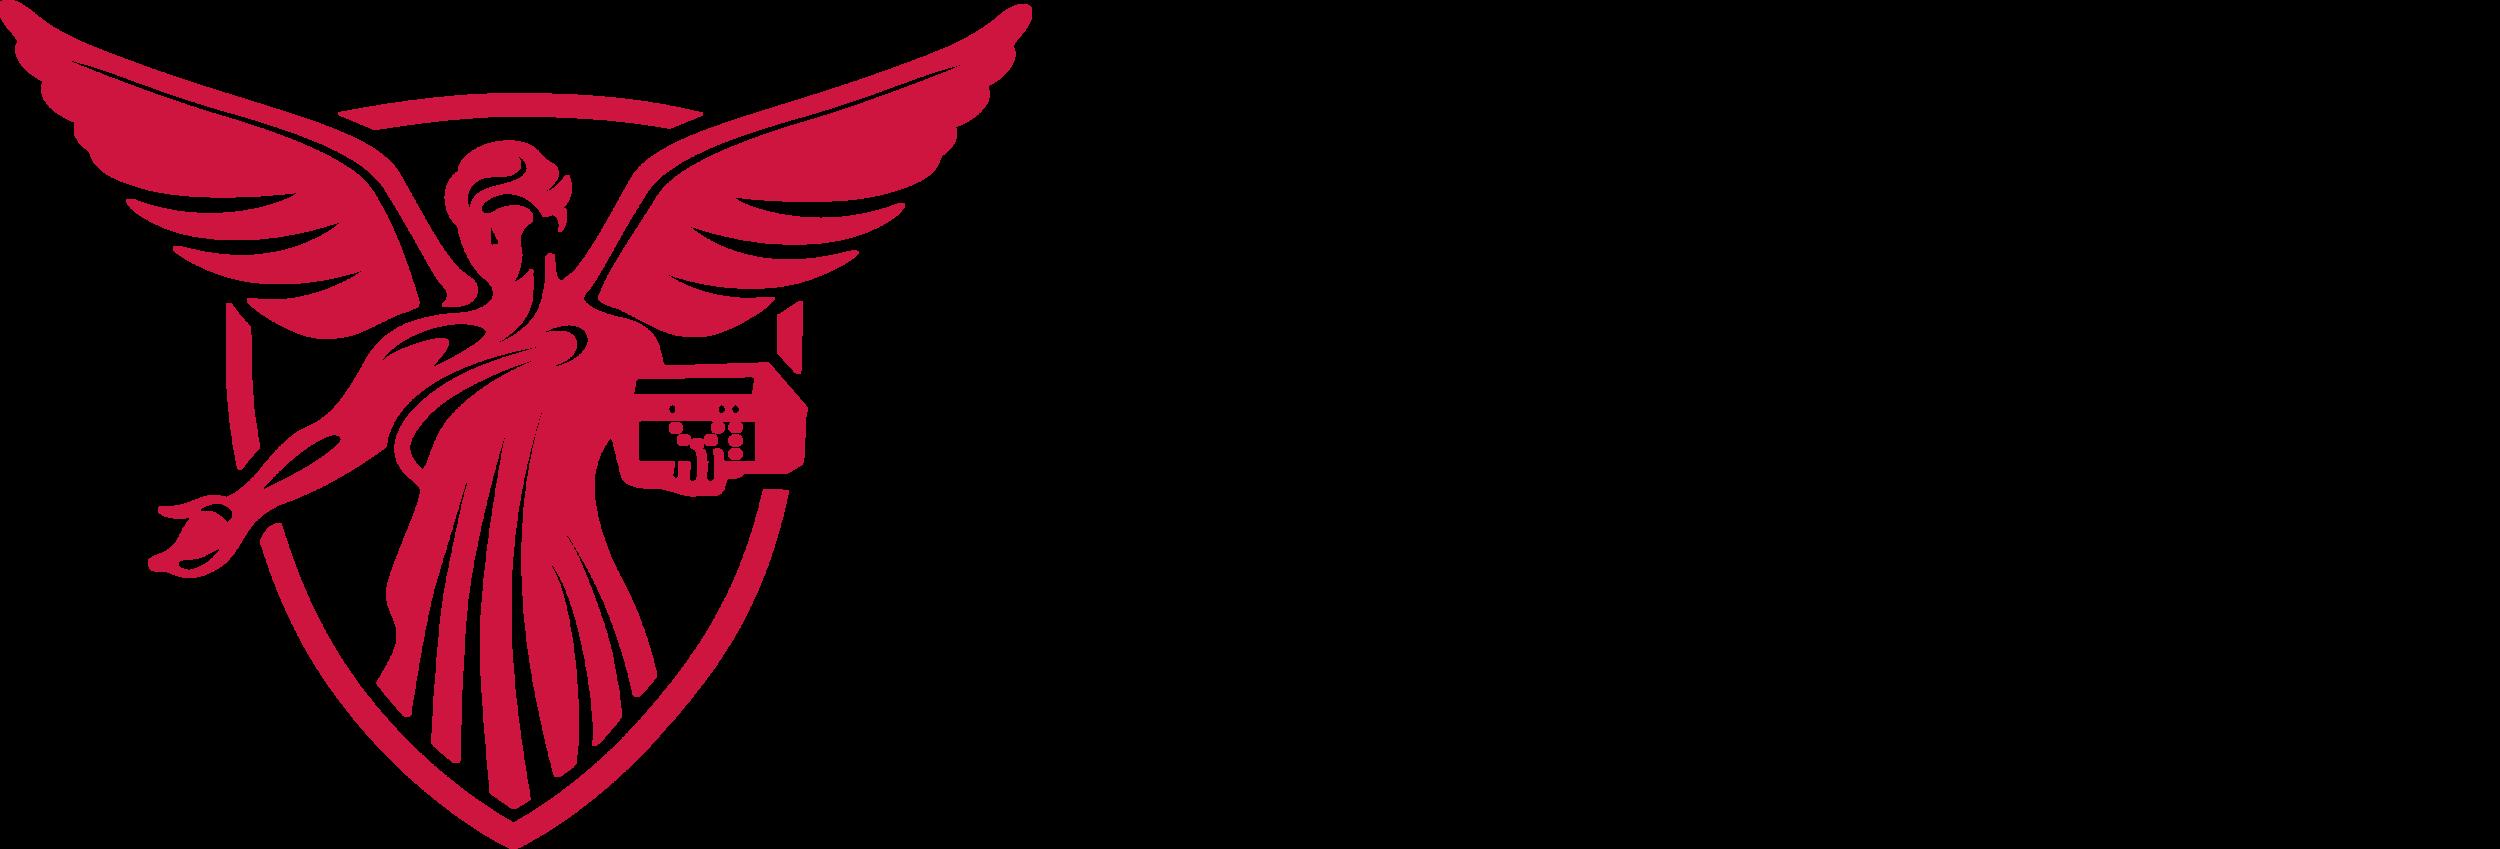 BSU-logo-horiz-CMYK.png